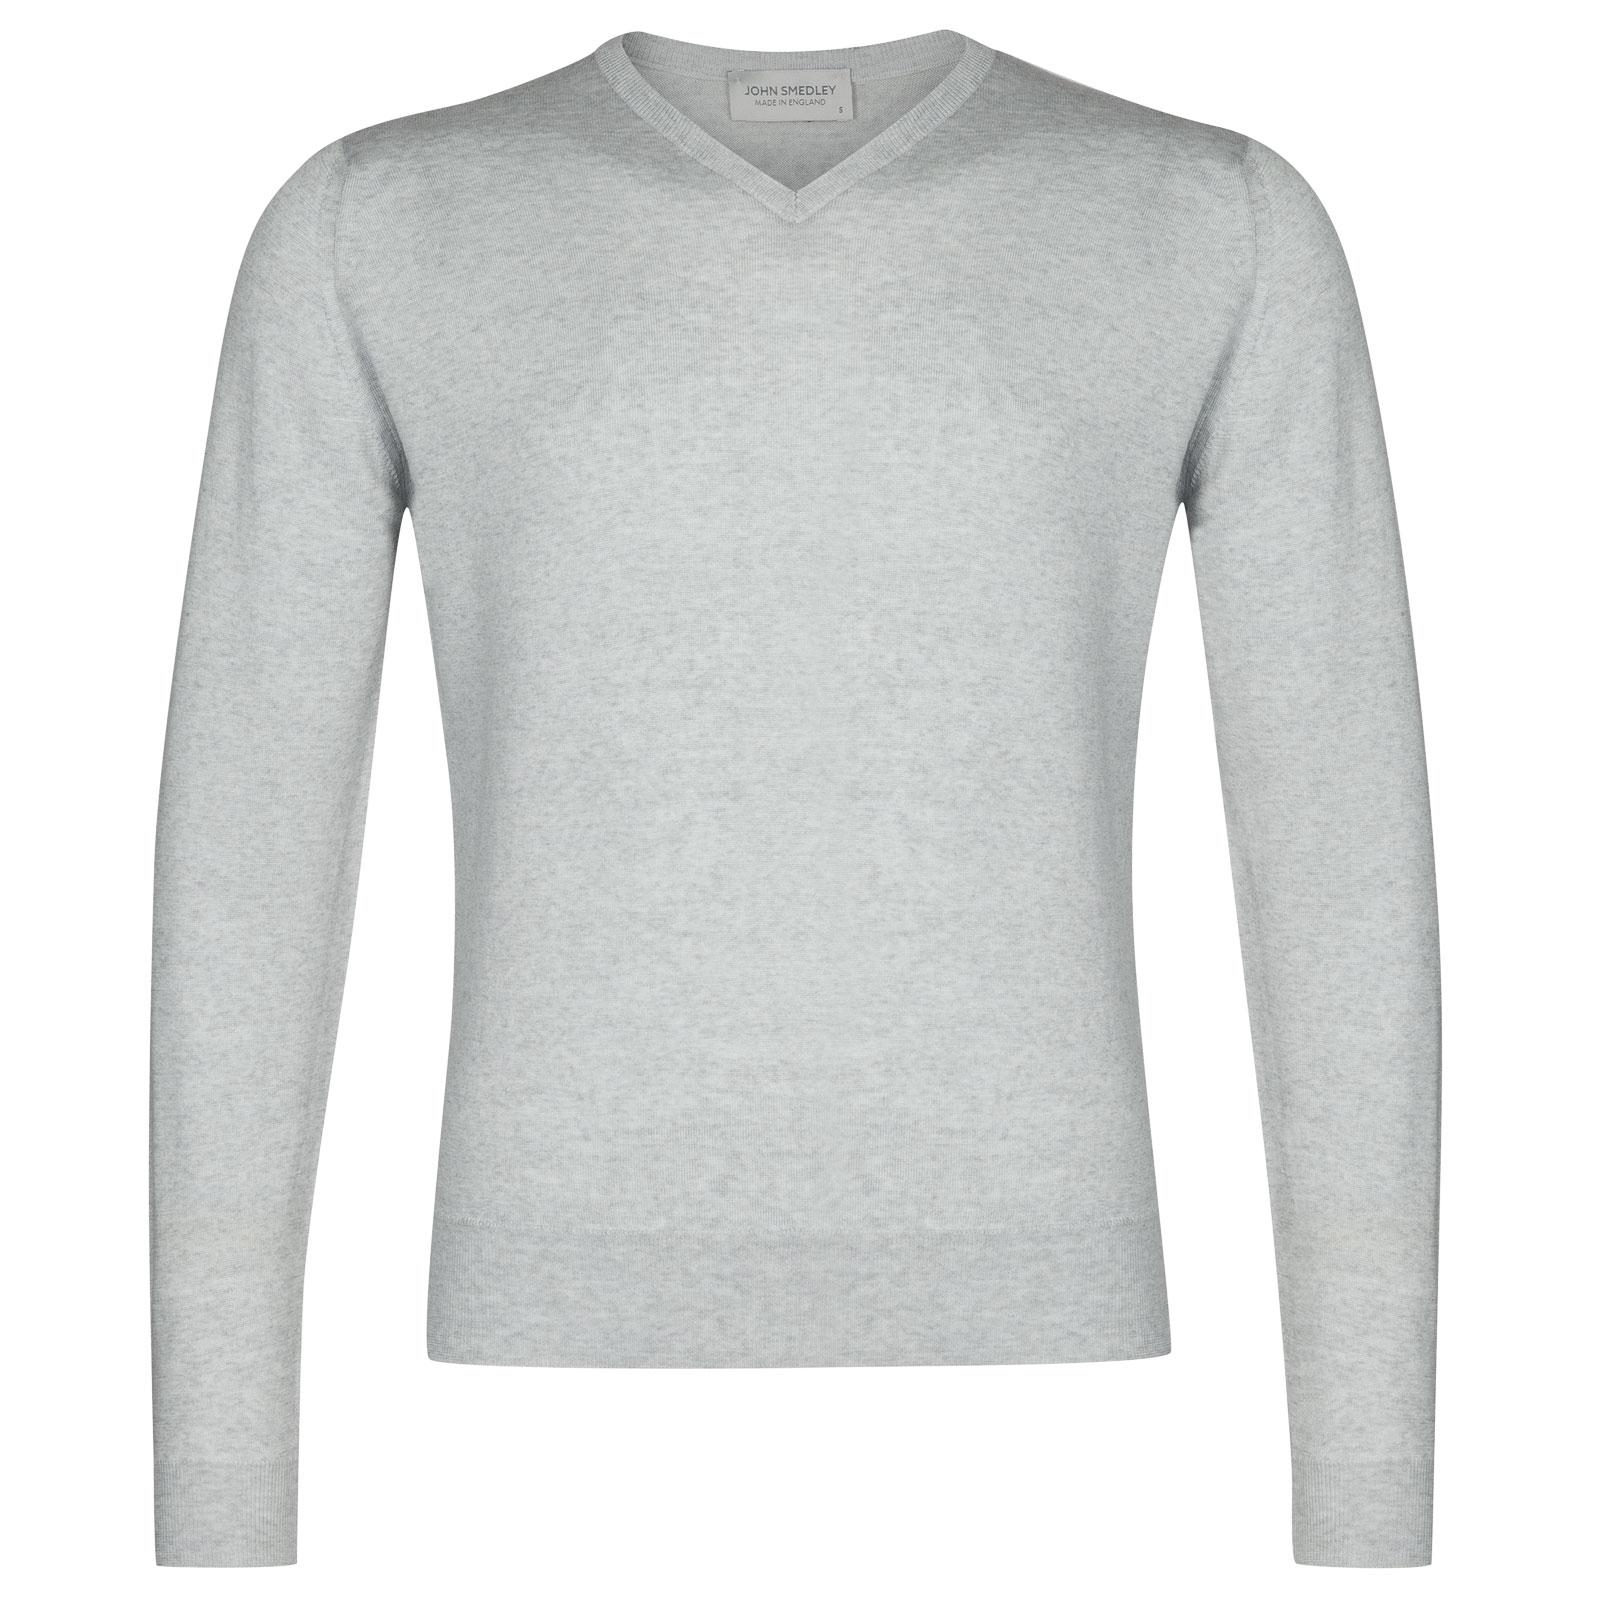 John Smedley Genoa Merino Wool Pullover in Bardot Grey-M